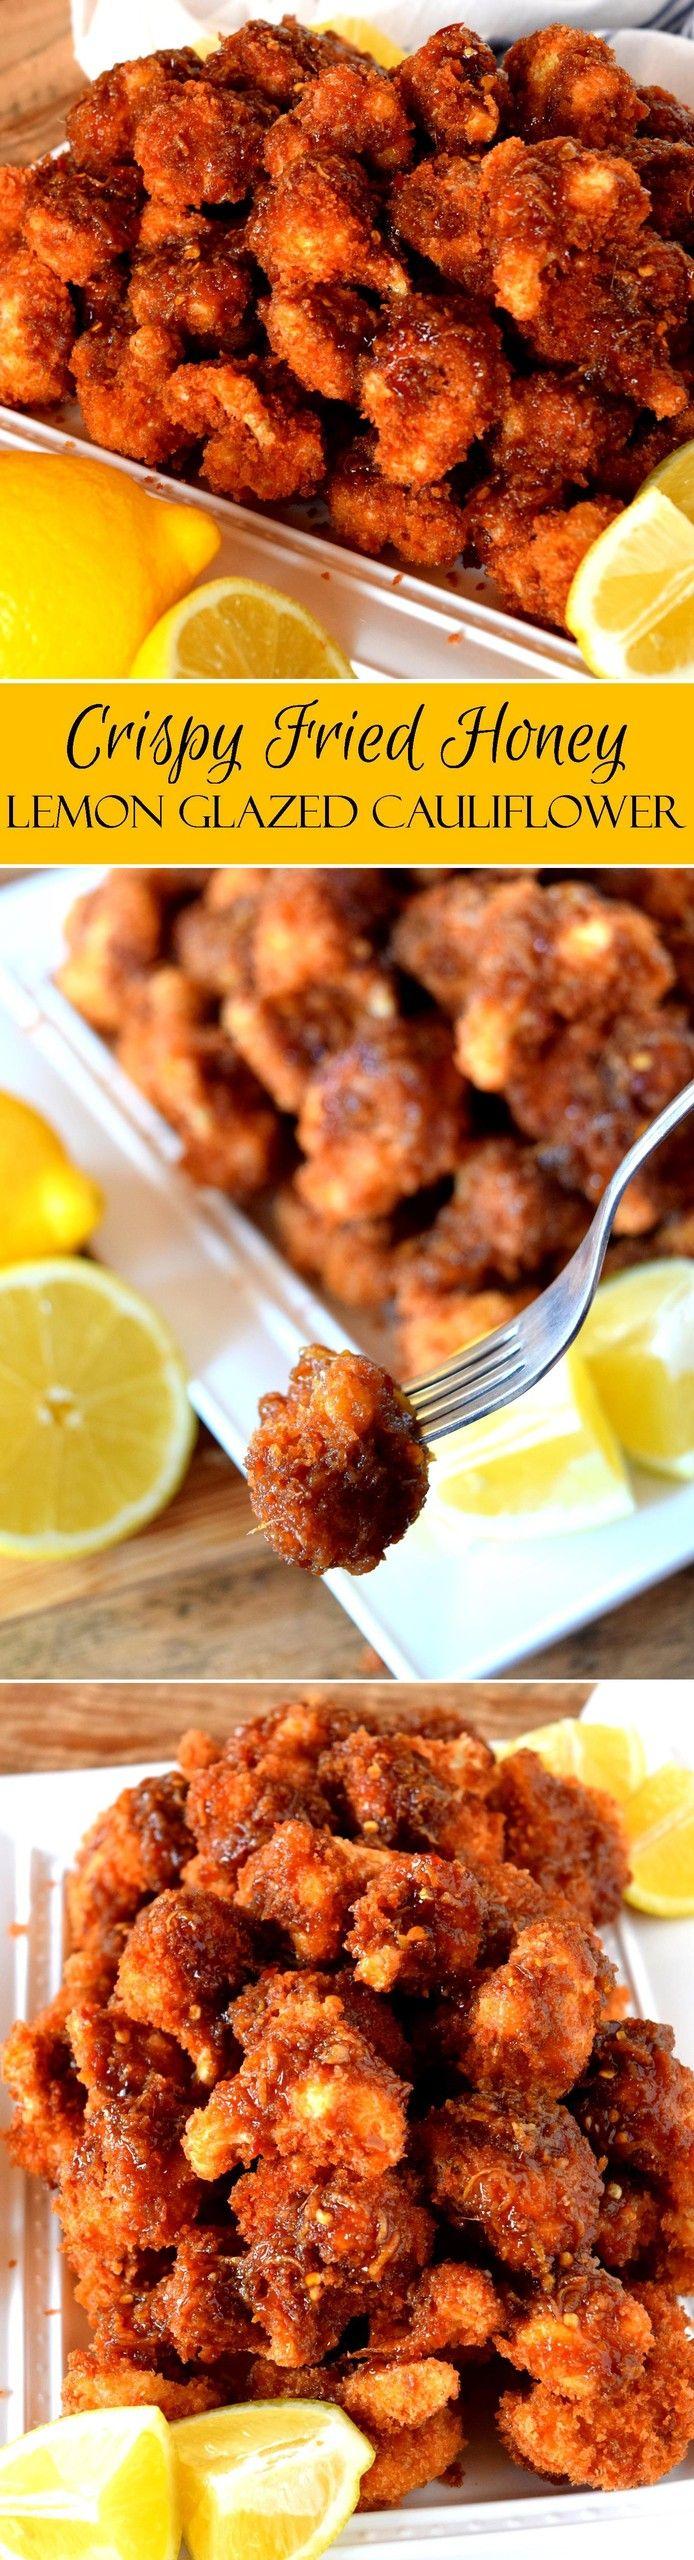 Crispy Fried Honey Lemon Glazed Cauliflower…